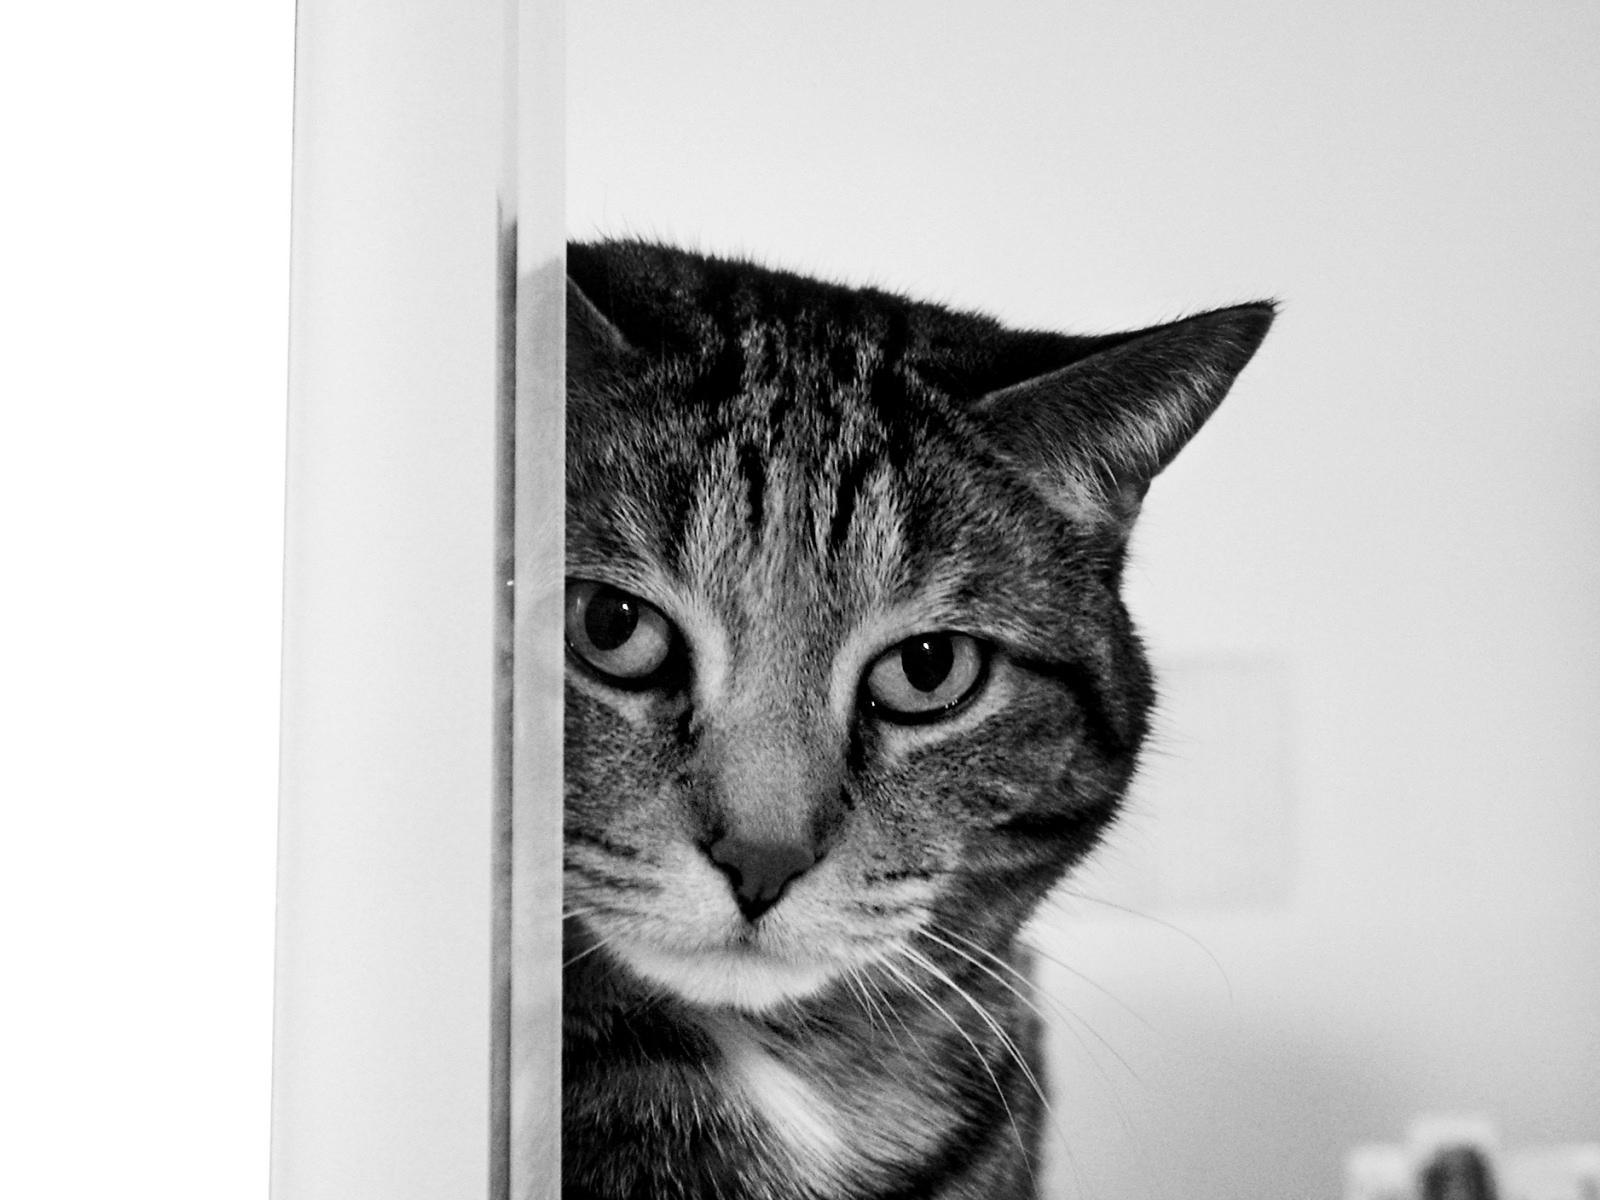 http://3.bp.blogspot.com/-1yJQ7mqPVPE/UDCTzwXWDaI/AAAAAAAAAO4/bFMURPzSNAo/s1600/Top+20+Cute+Animals+Pics5.jpg